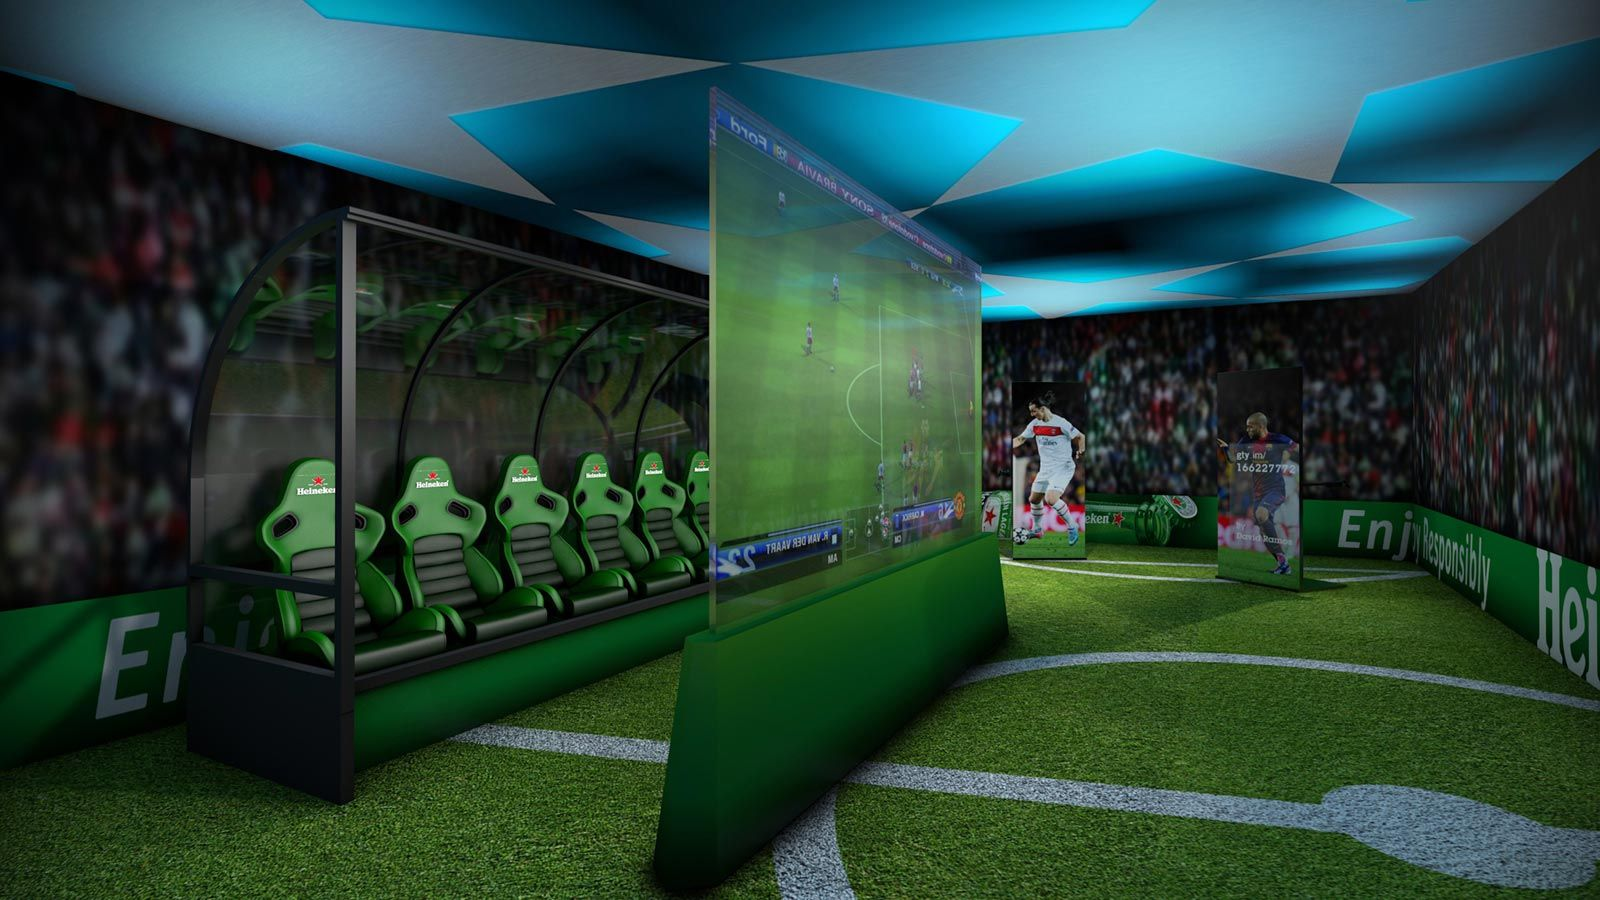 Heineken International experience center/ UEFA Champions